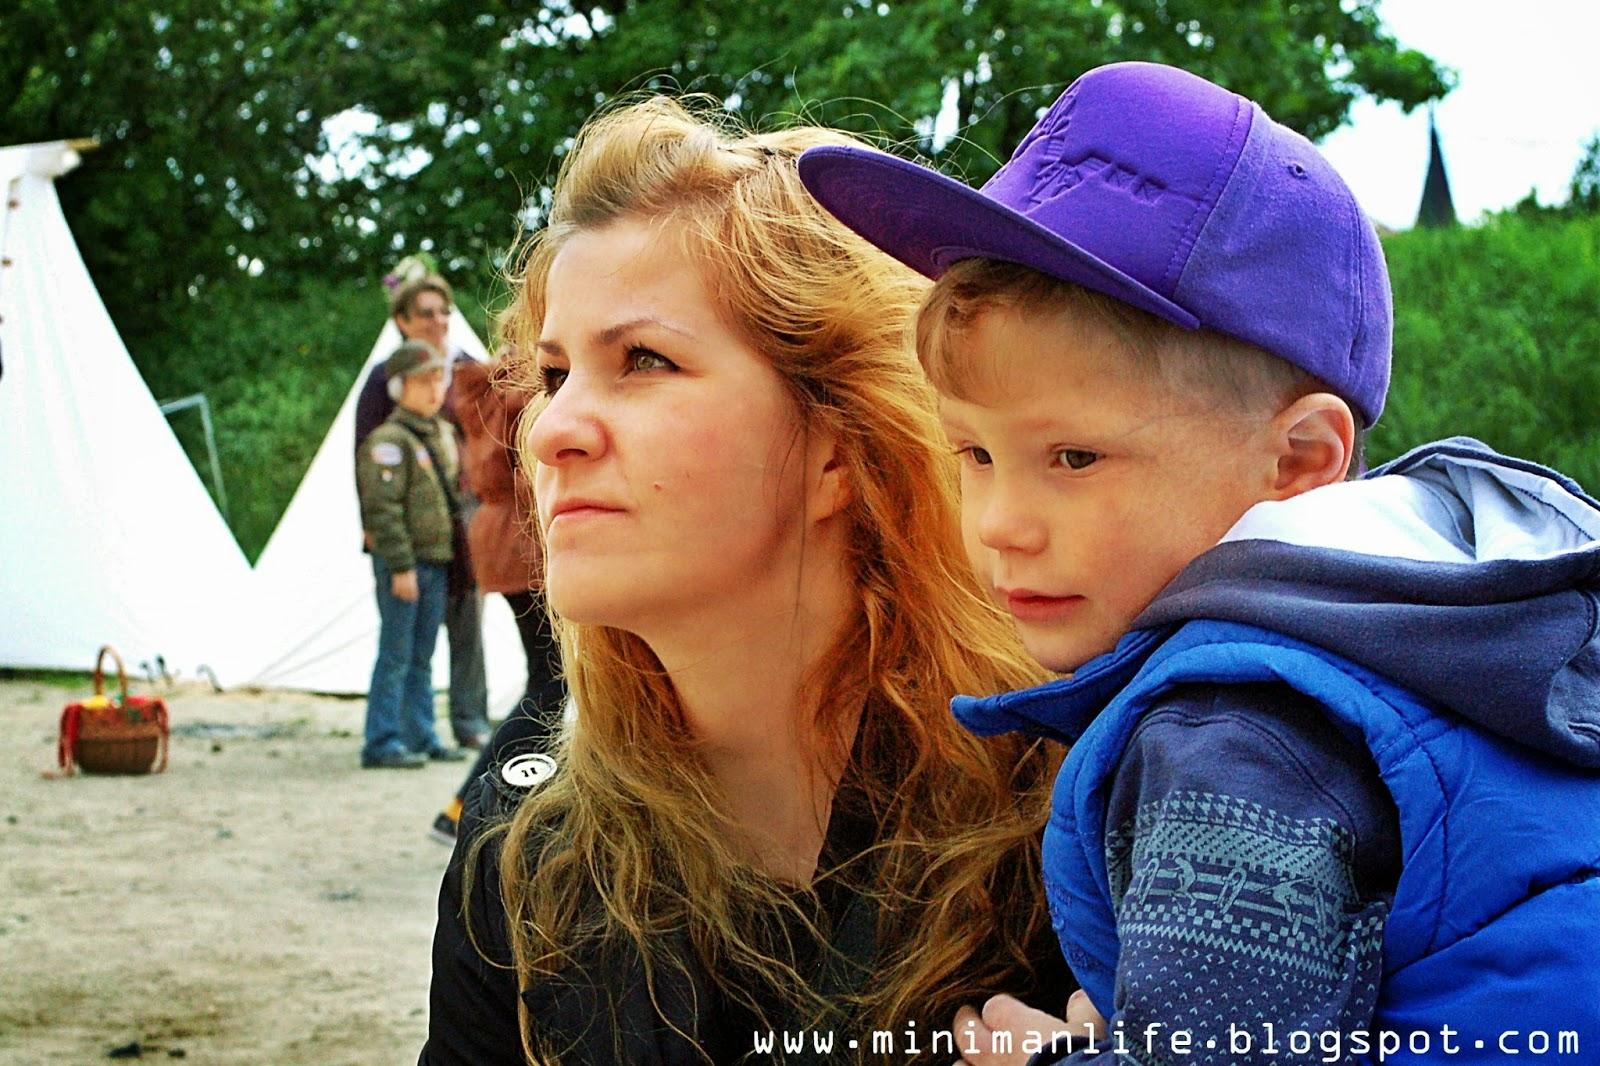 http://minimanlife.blogspot.com/2014/05/idealny-prezent-na-dzien-dziecka-konkurs.html